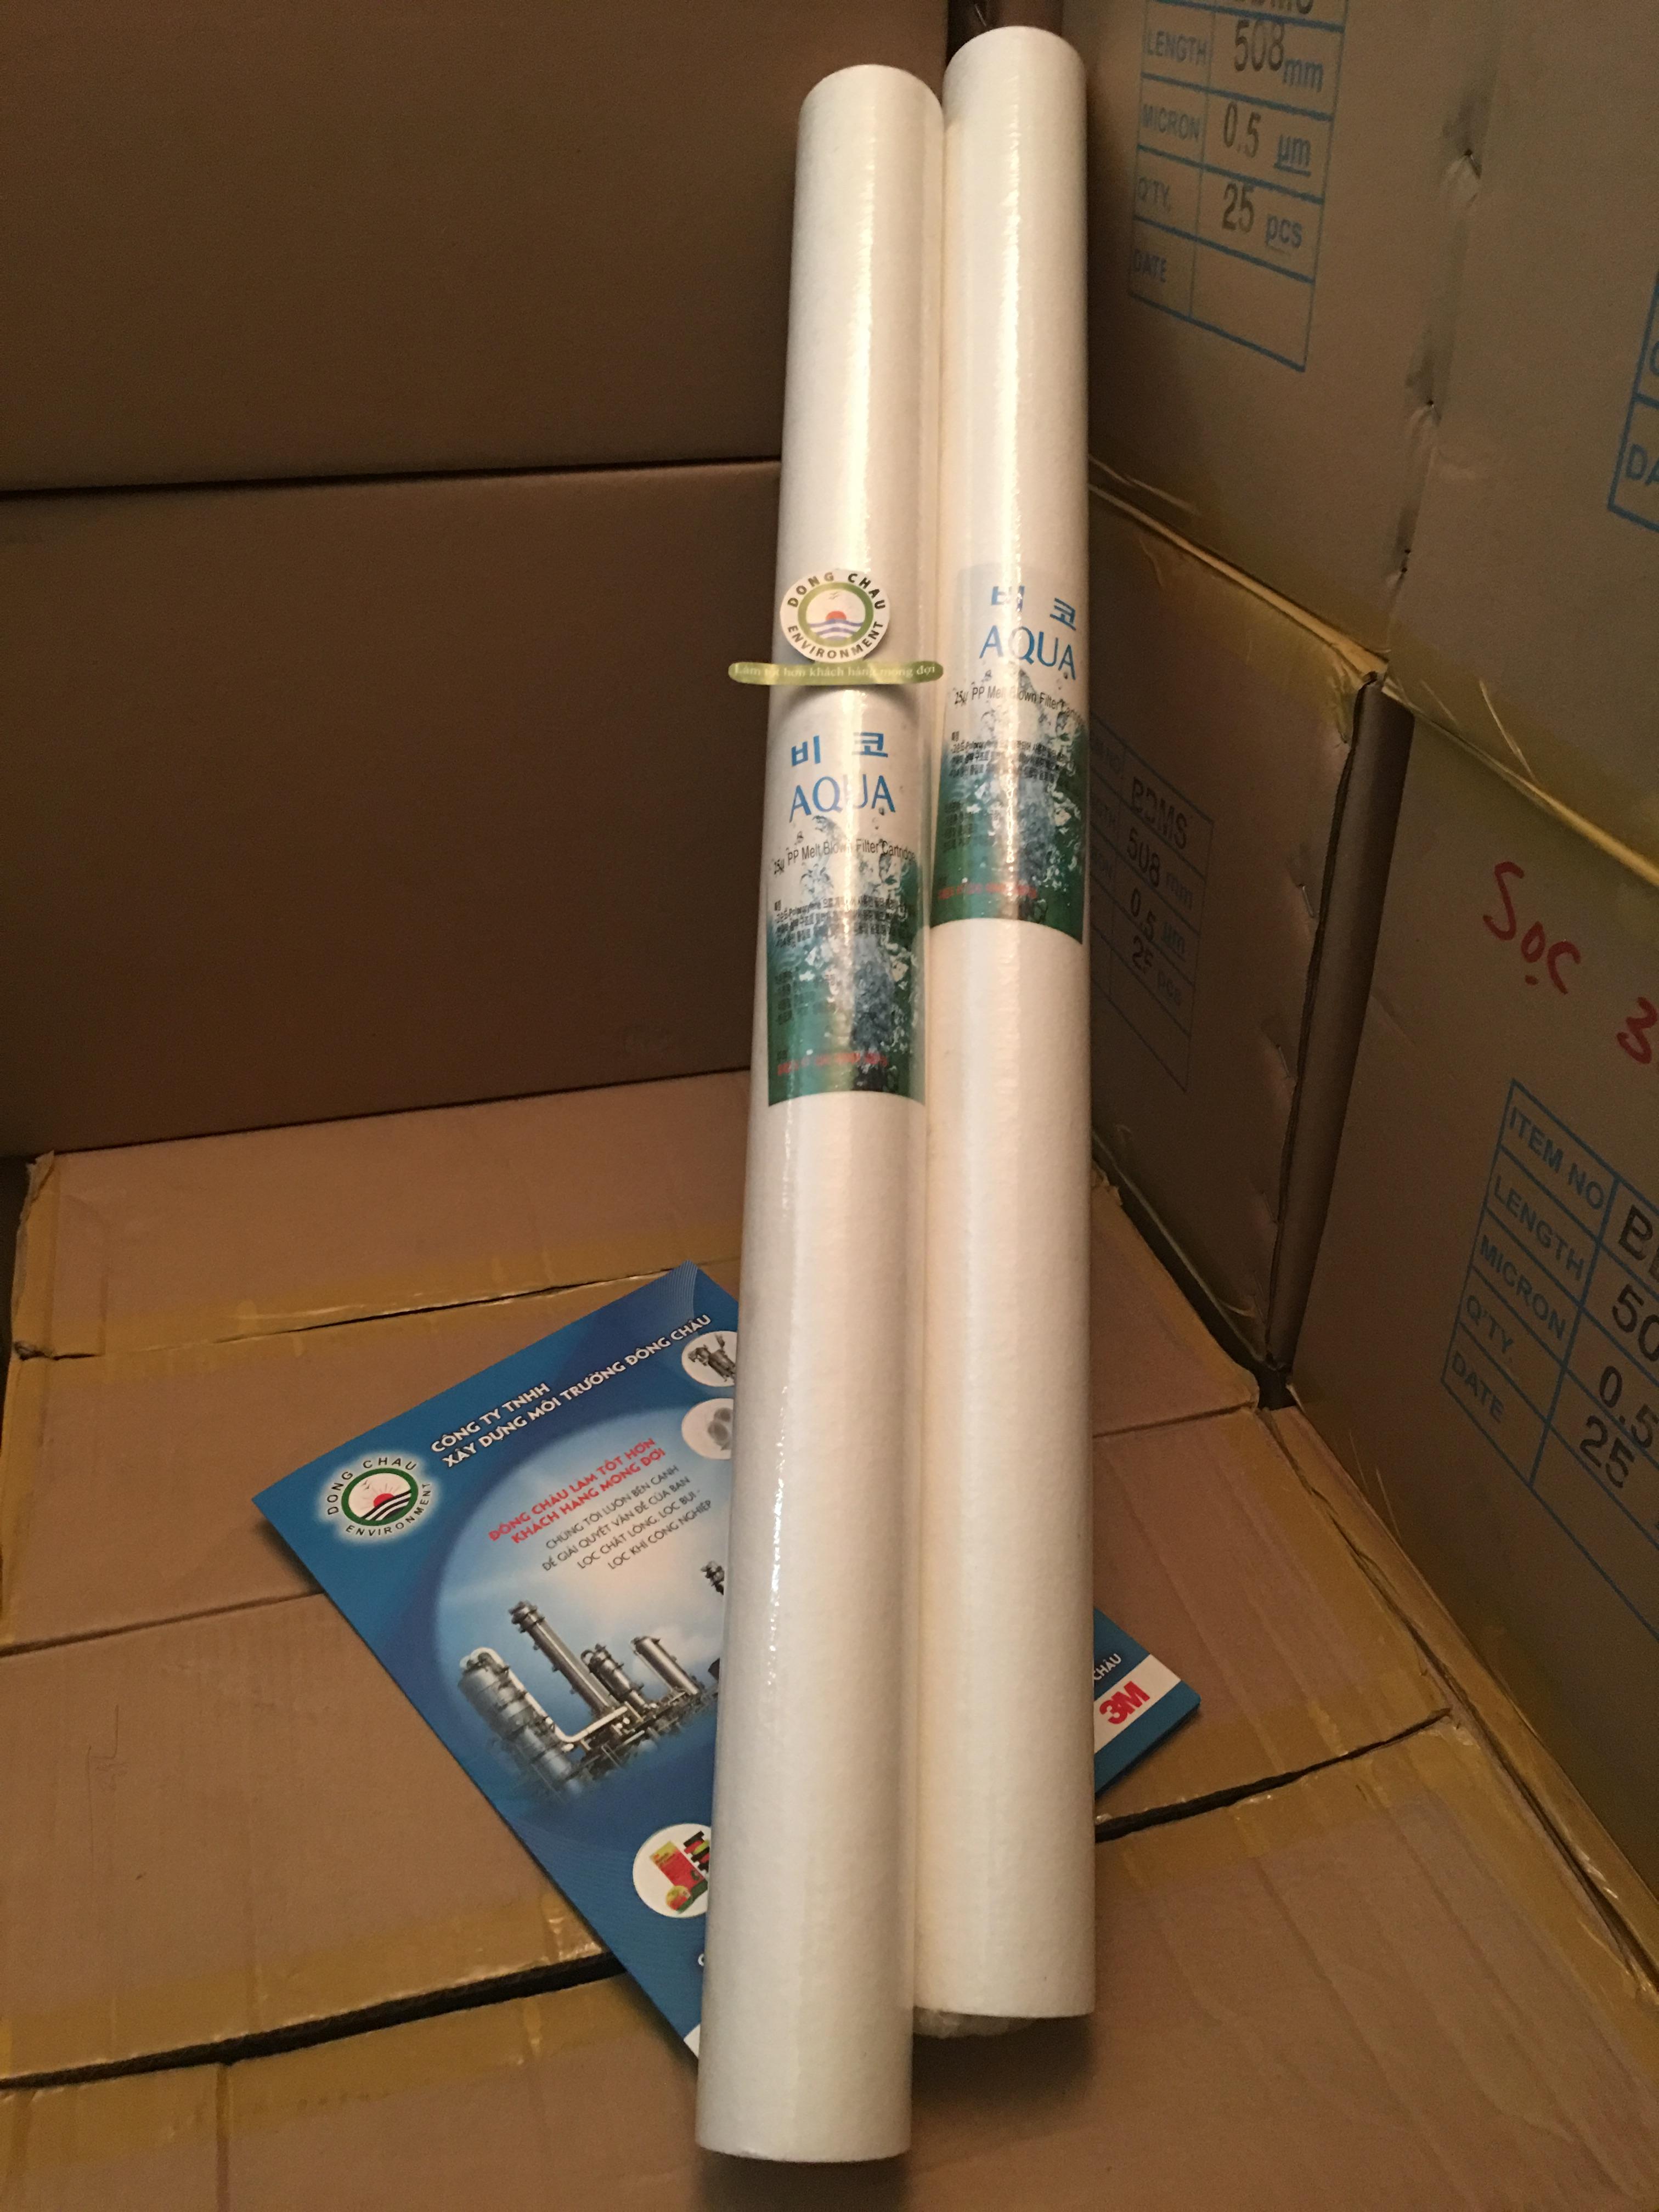 Lõi lọc nén Aqua 25 micron 30 inch